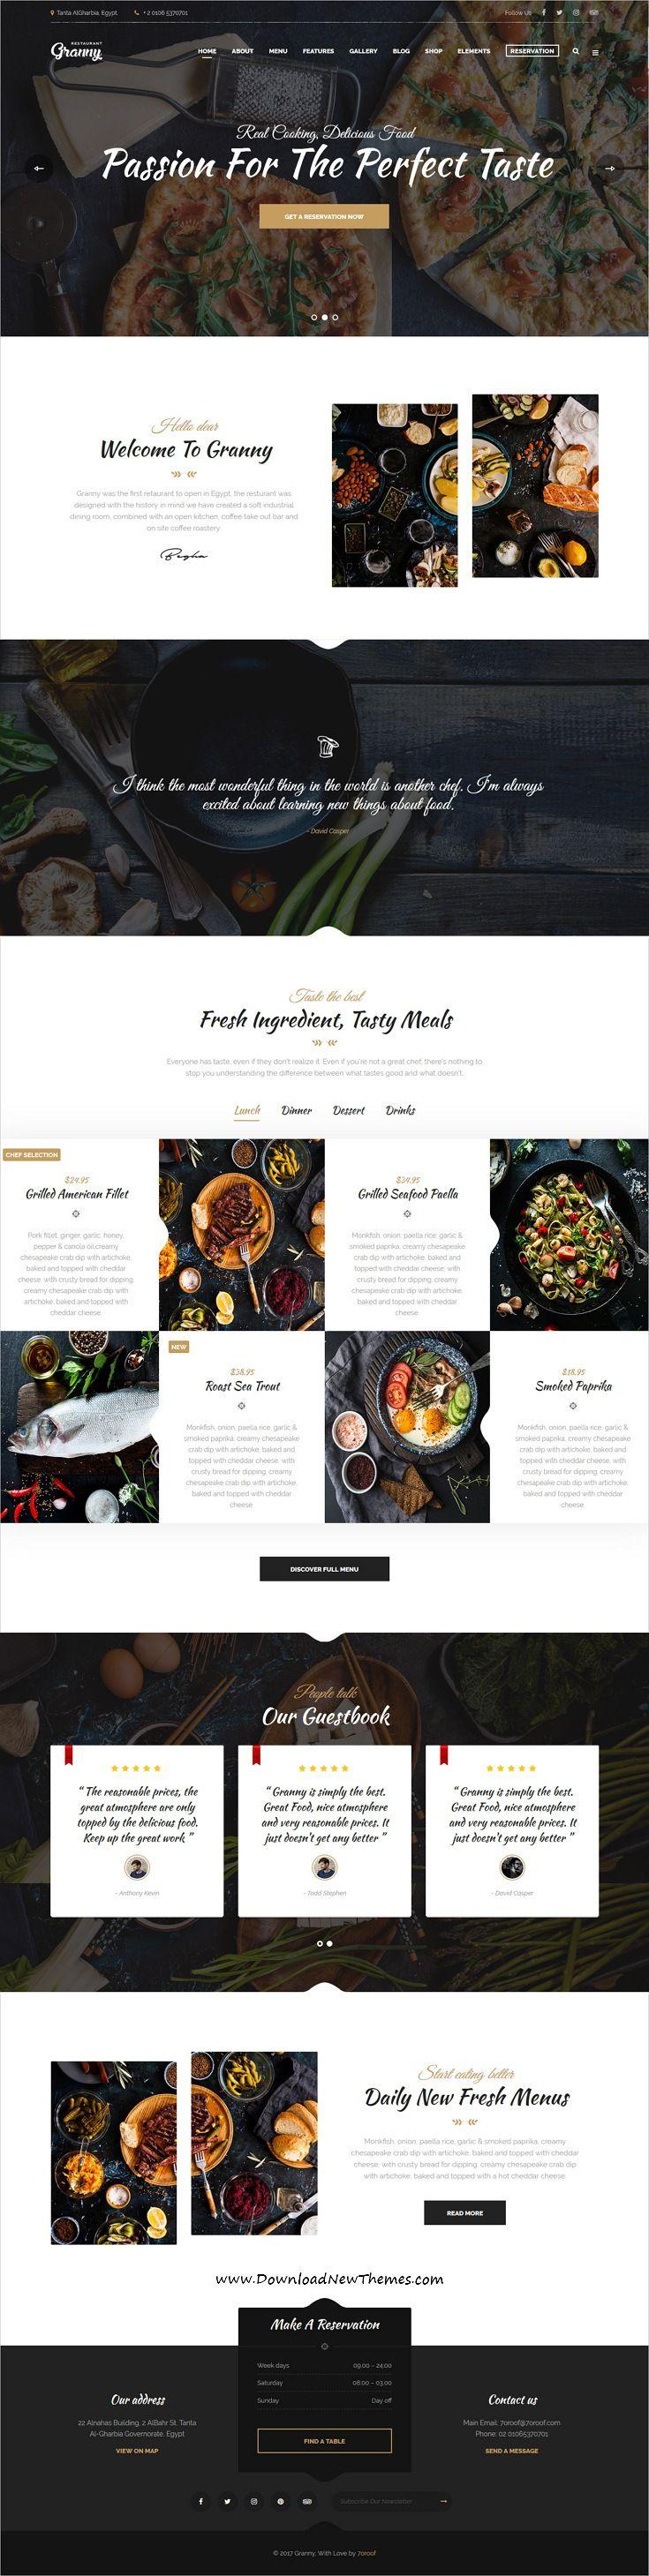 37 best Coffee Website Design images on Pinterest